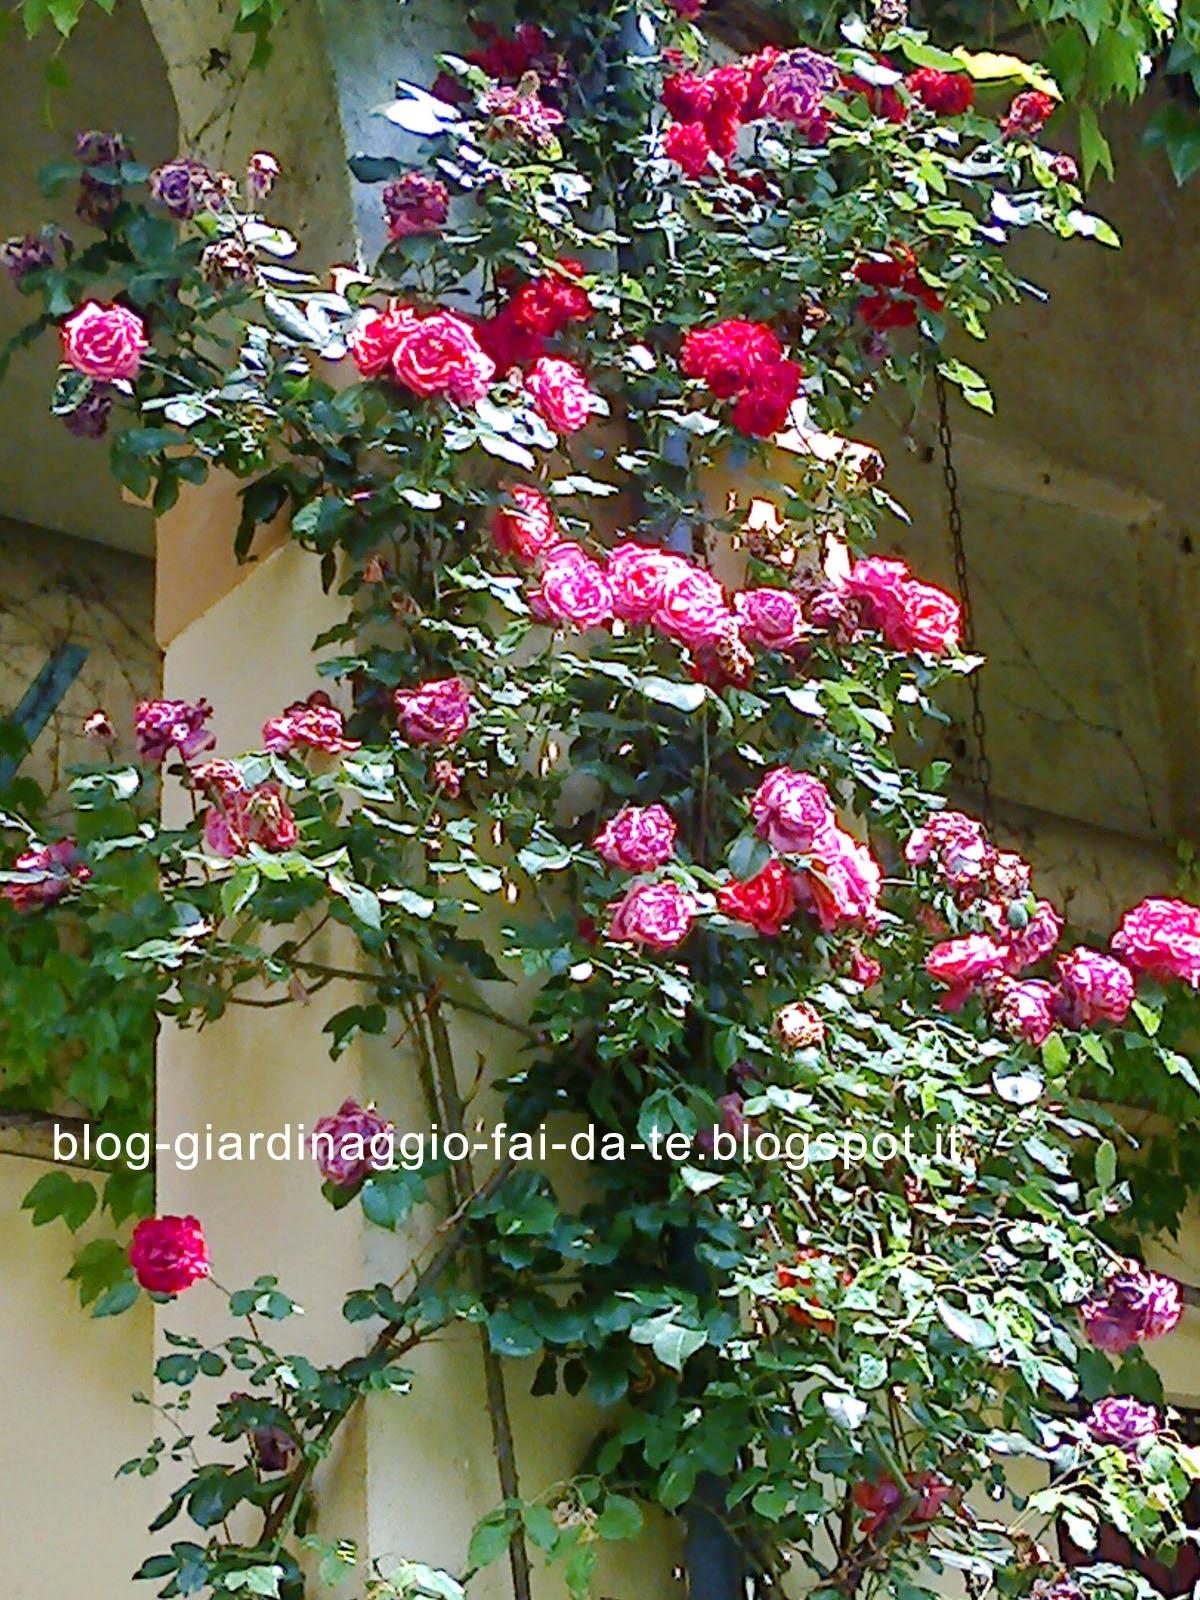 Outdoors gardening and landscape giardino e giardinaggio on pinterest courtyards boxwood - Rose coltivazione in giardino ...